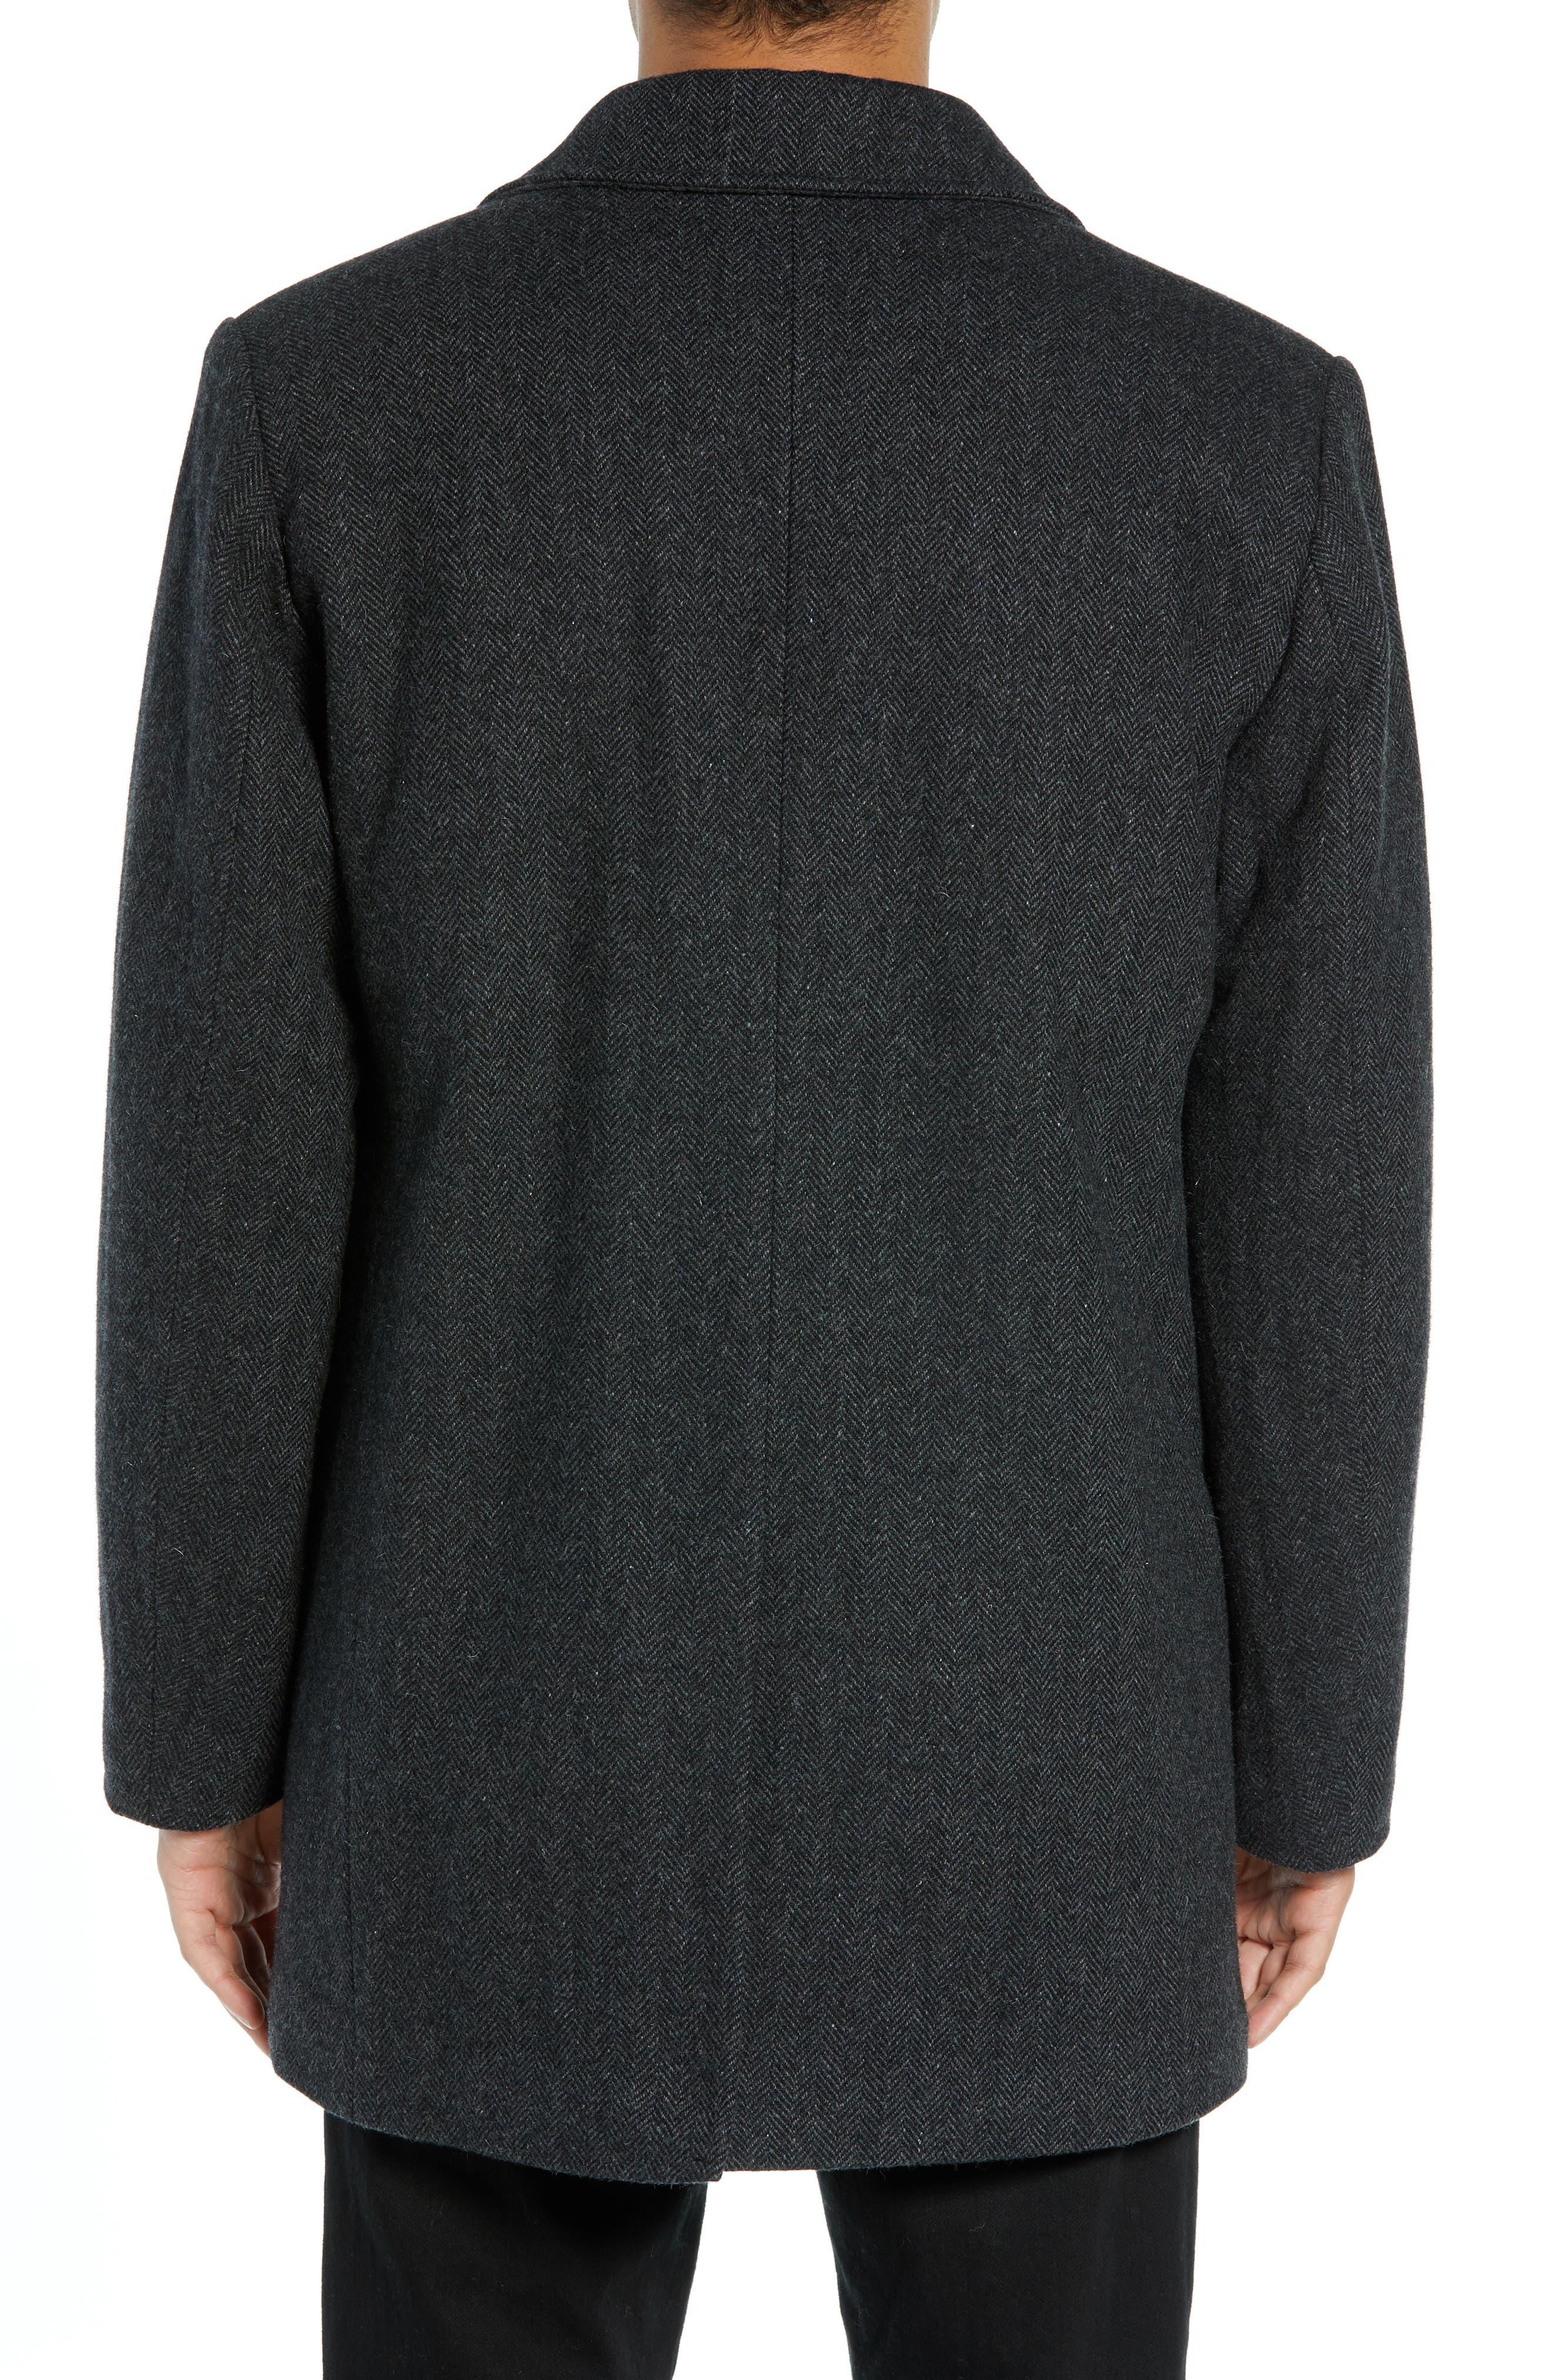 PENDLETON, Iconic Textures Manhattan Wool Blend Top Coat, Alternate thumbnail 2, color, CHARCOAL HERRINGBONE